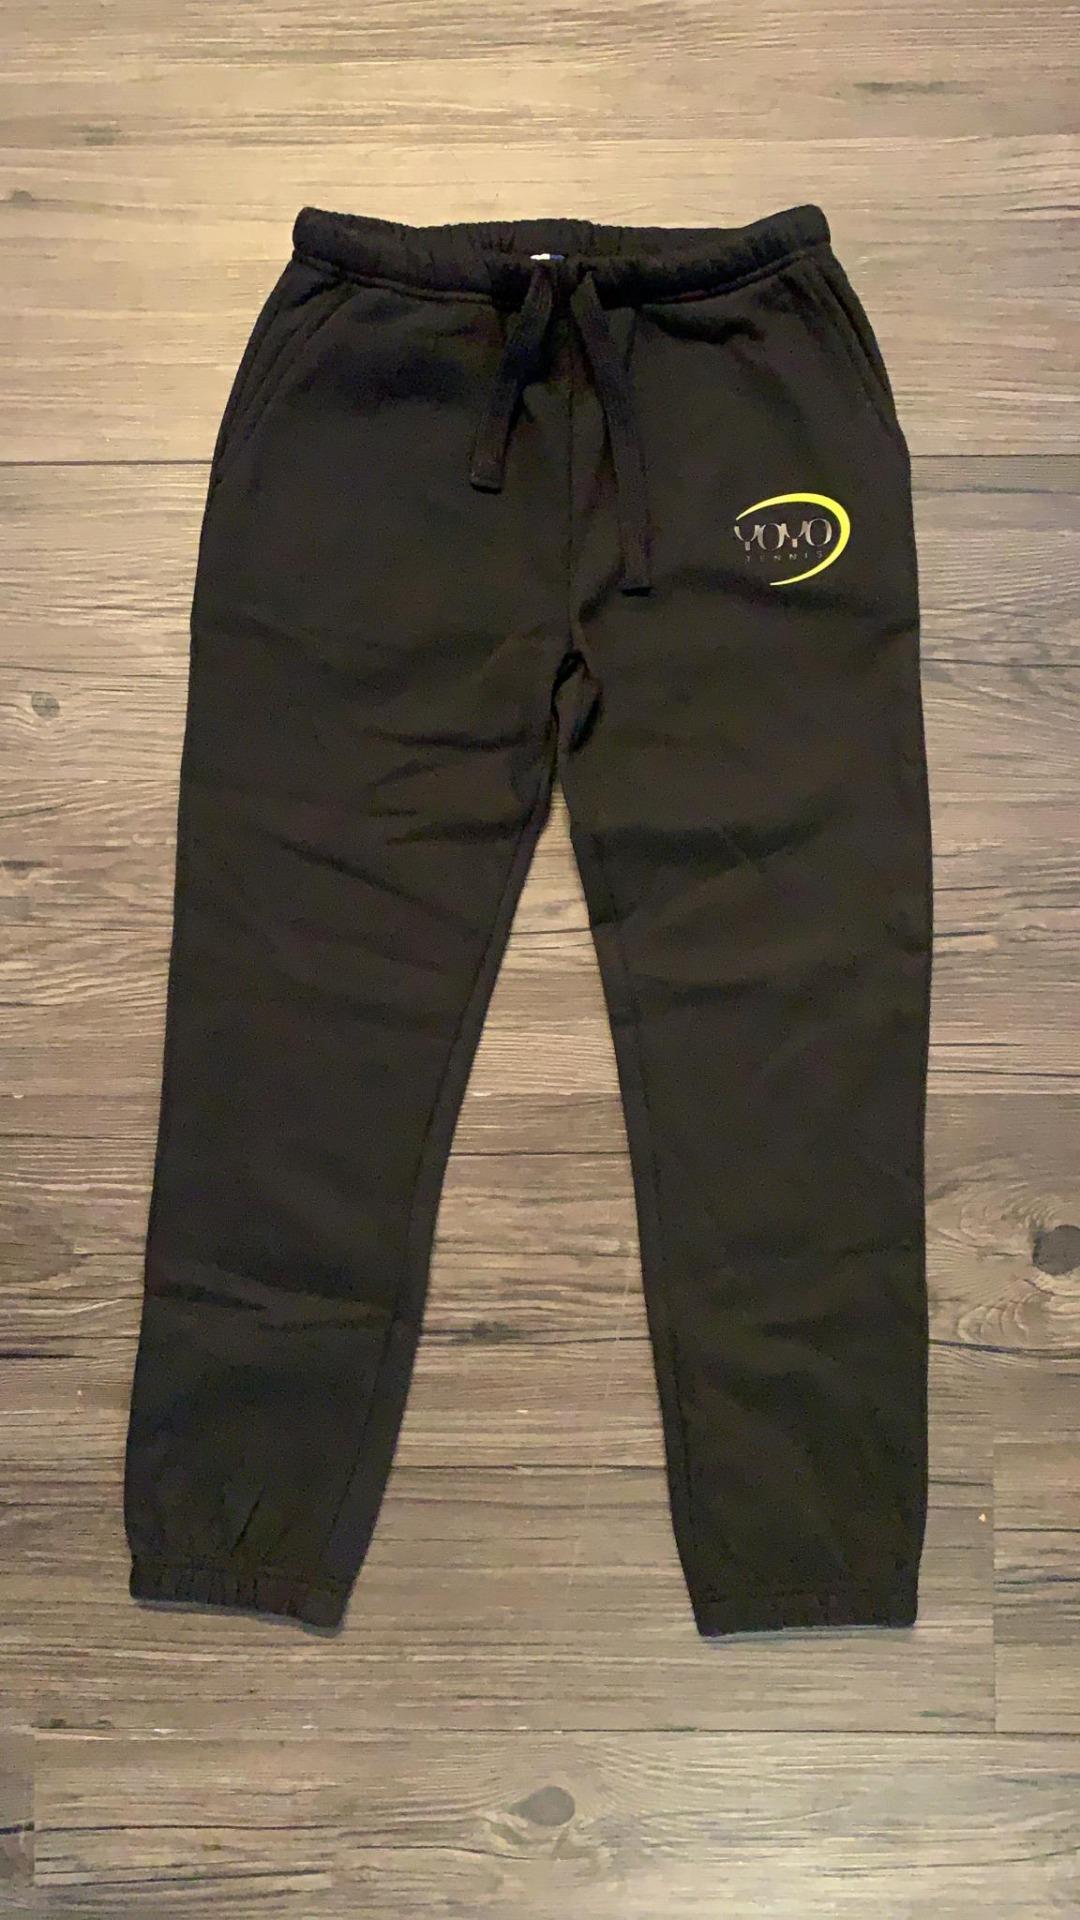 YOYO-TENNIS Pant Nero con Logo Giallo Bambino